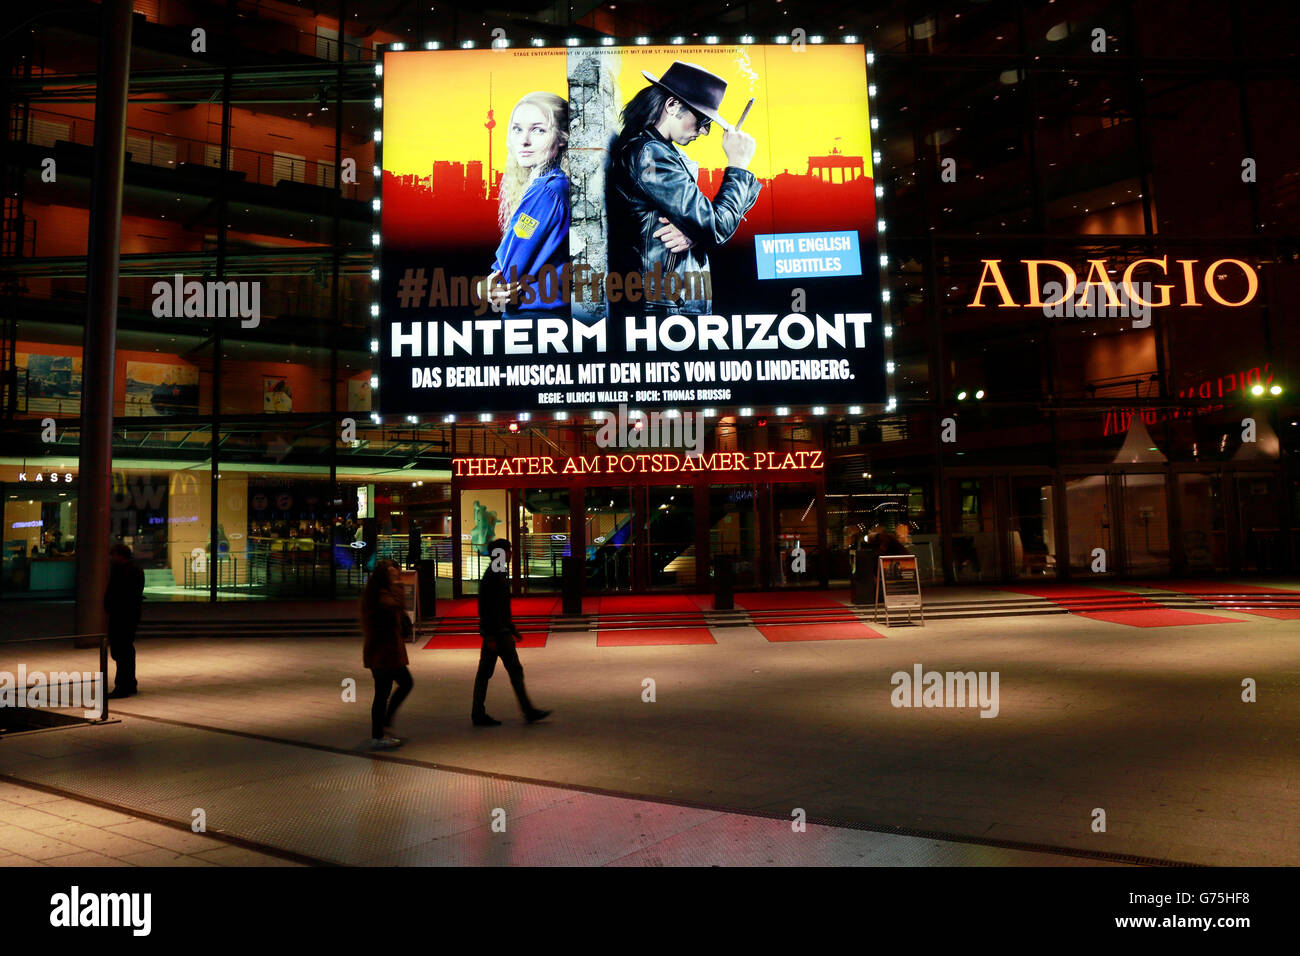 Werbung fuer das Udo Lindenberg-Musical 'Hinterm Horizont', Musical Theater, Marlene-Dietrich Platz, Berlin - Stock Image